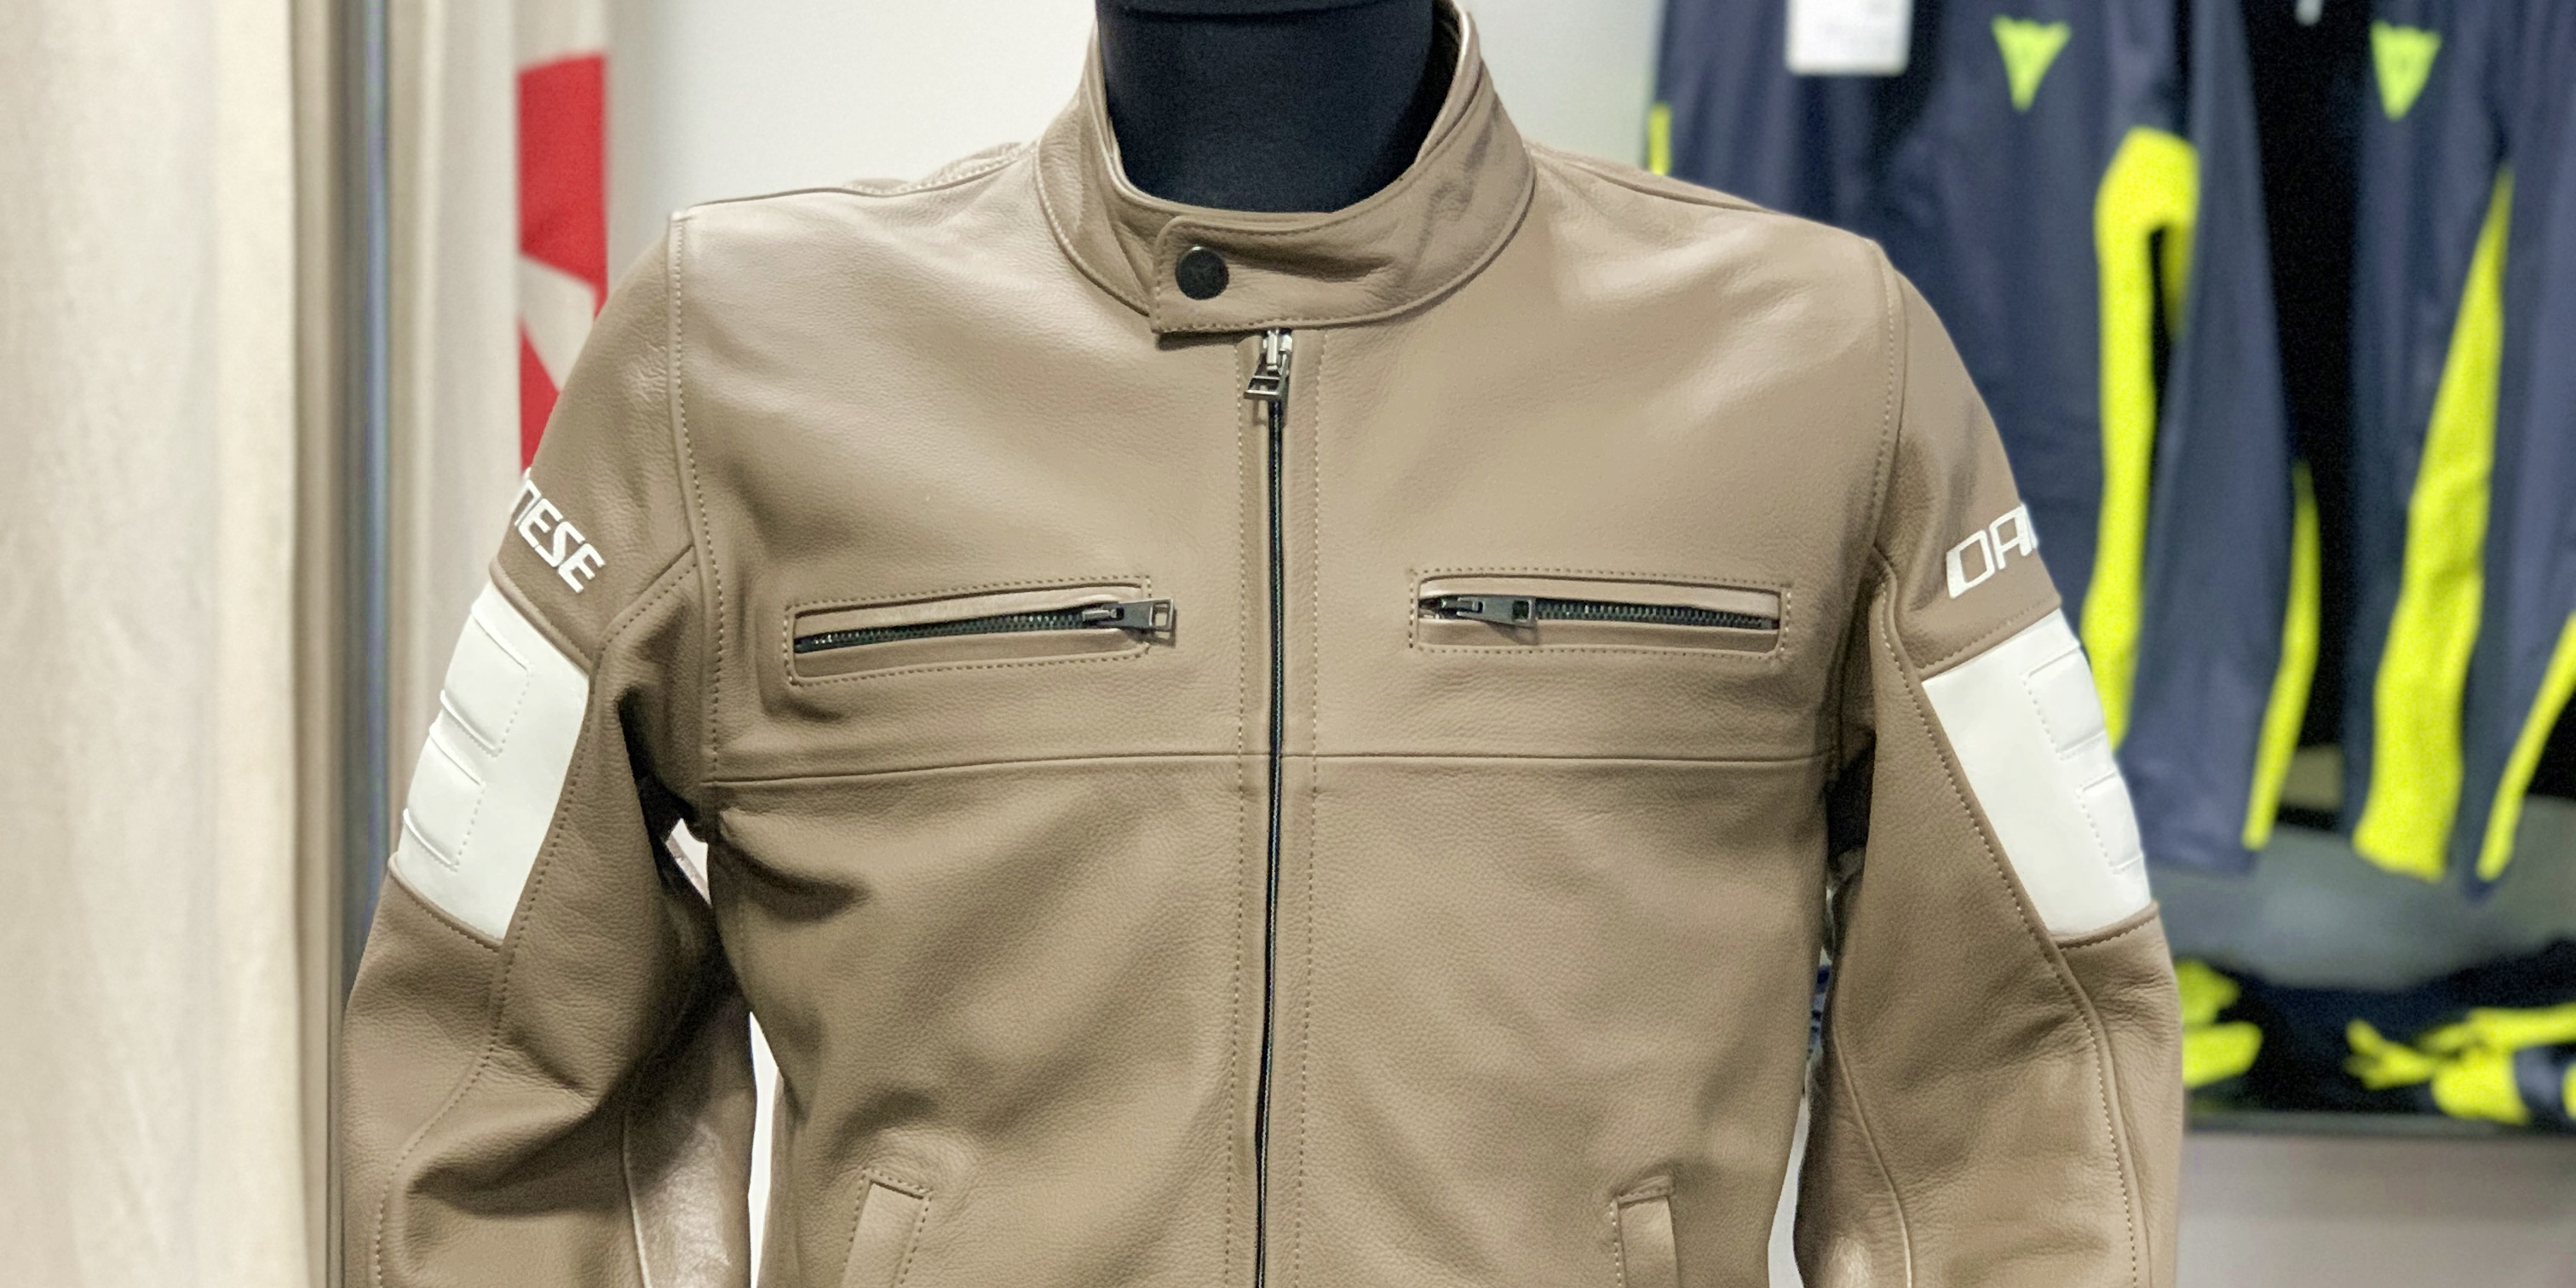 【SAN DIEGO LEATHER JACKET】ネオクラシカルなレザージャケットのご紹介